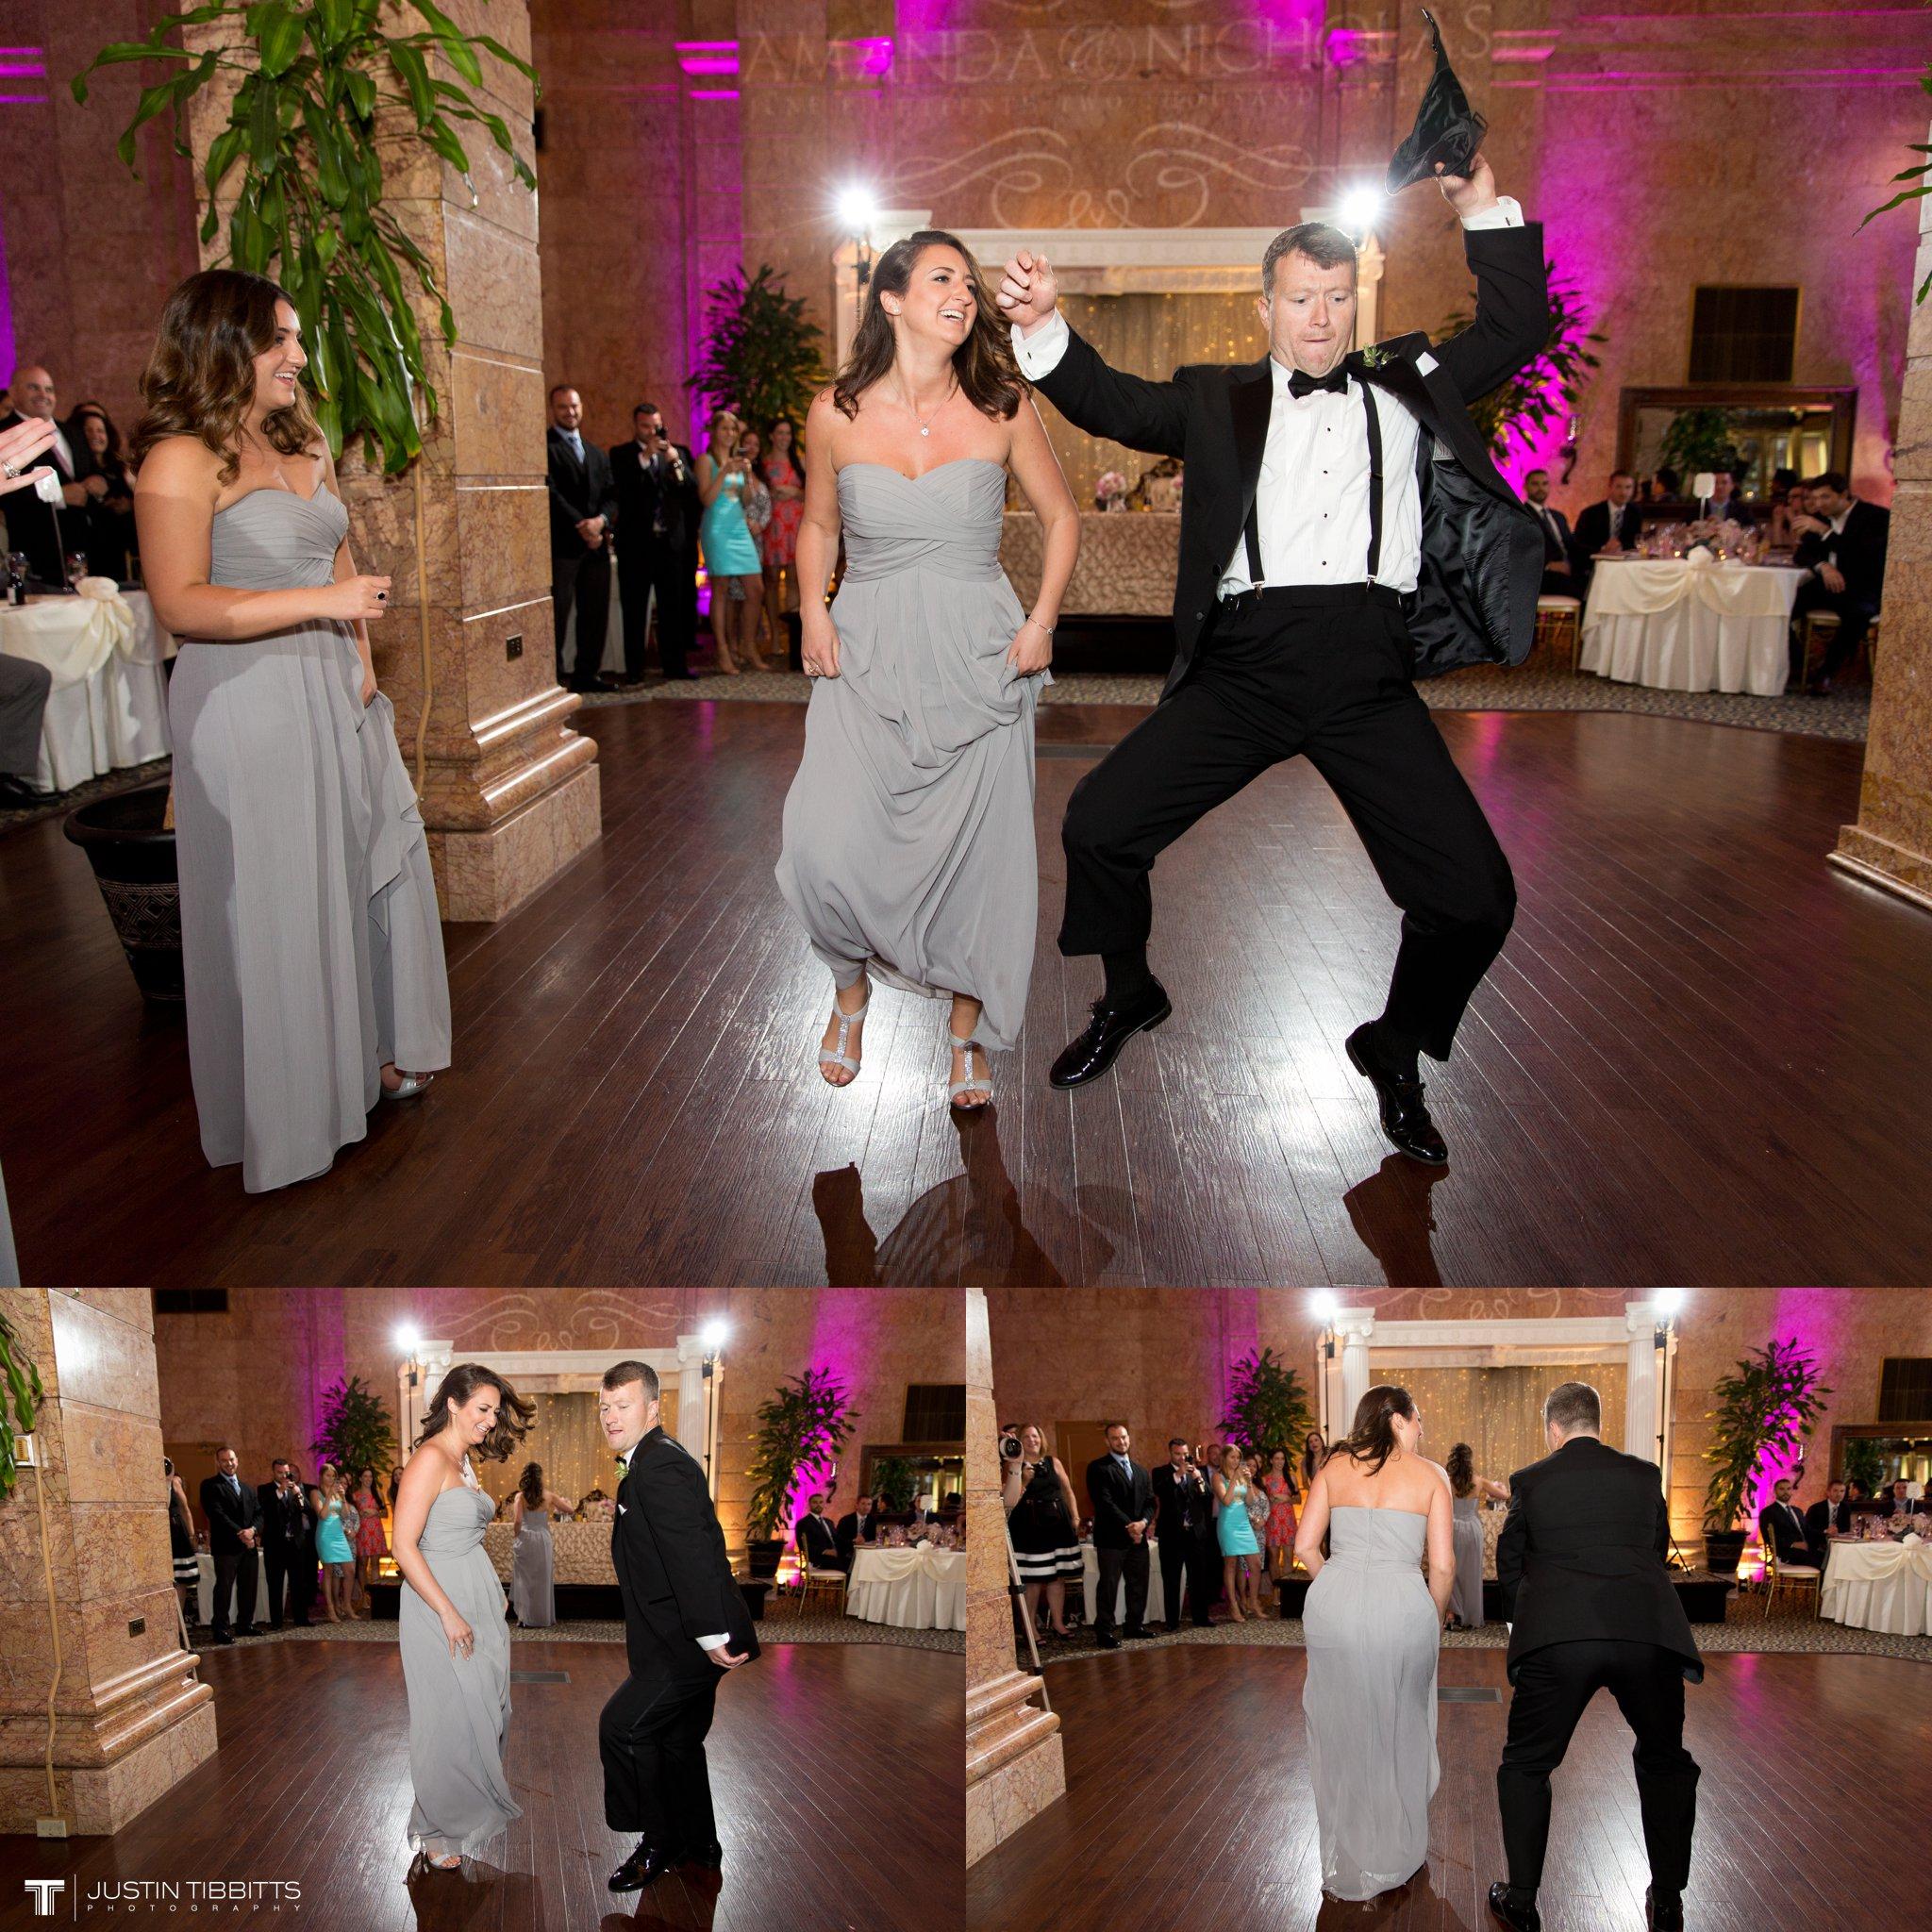 state-room-wedding-photos-with-amanda-and-nick_0148